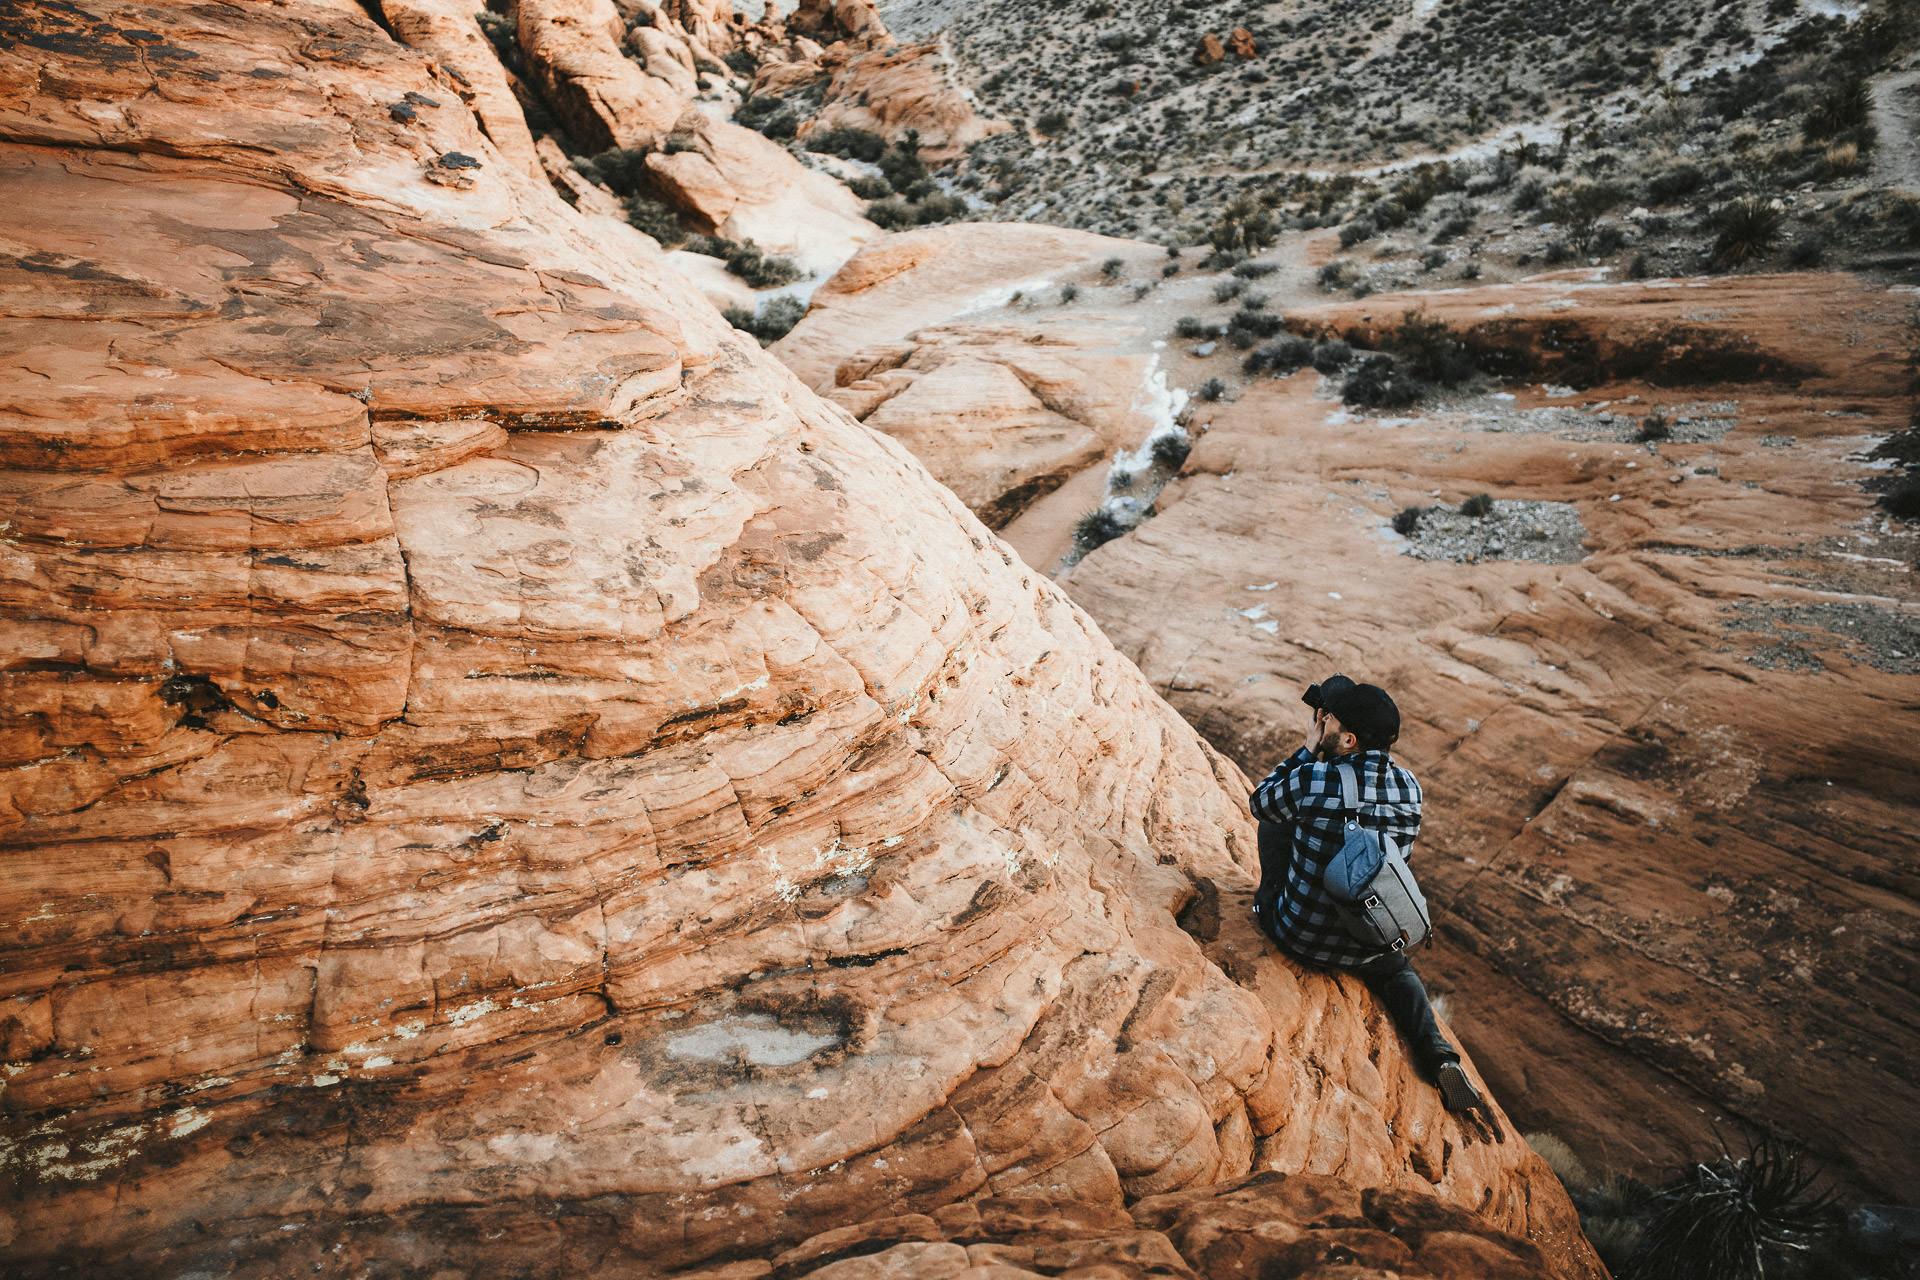 Twisted-oaks-studio-wppi-leica-red-rock-canyon-0050.jpg